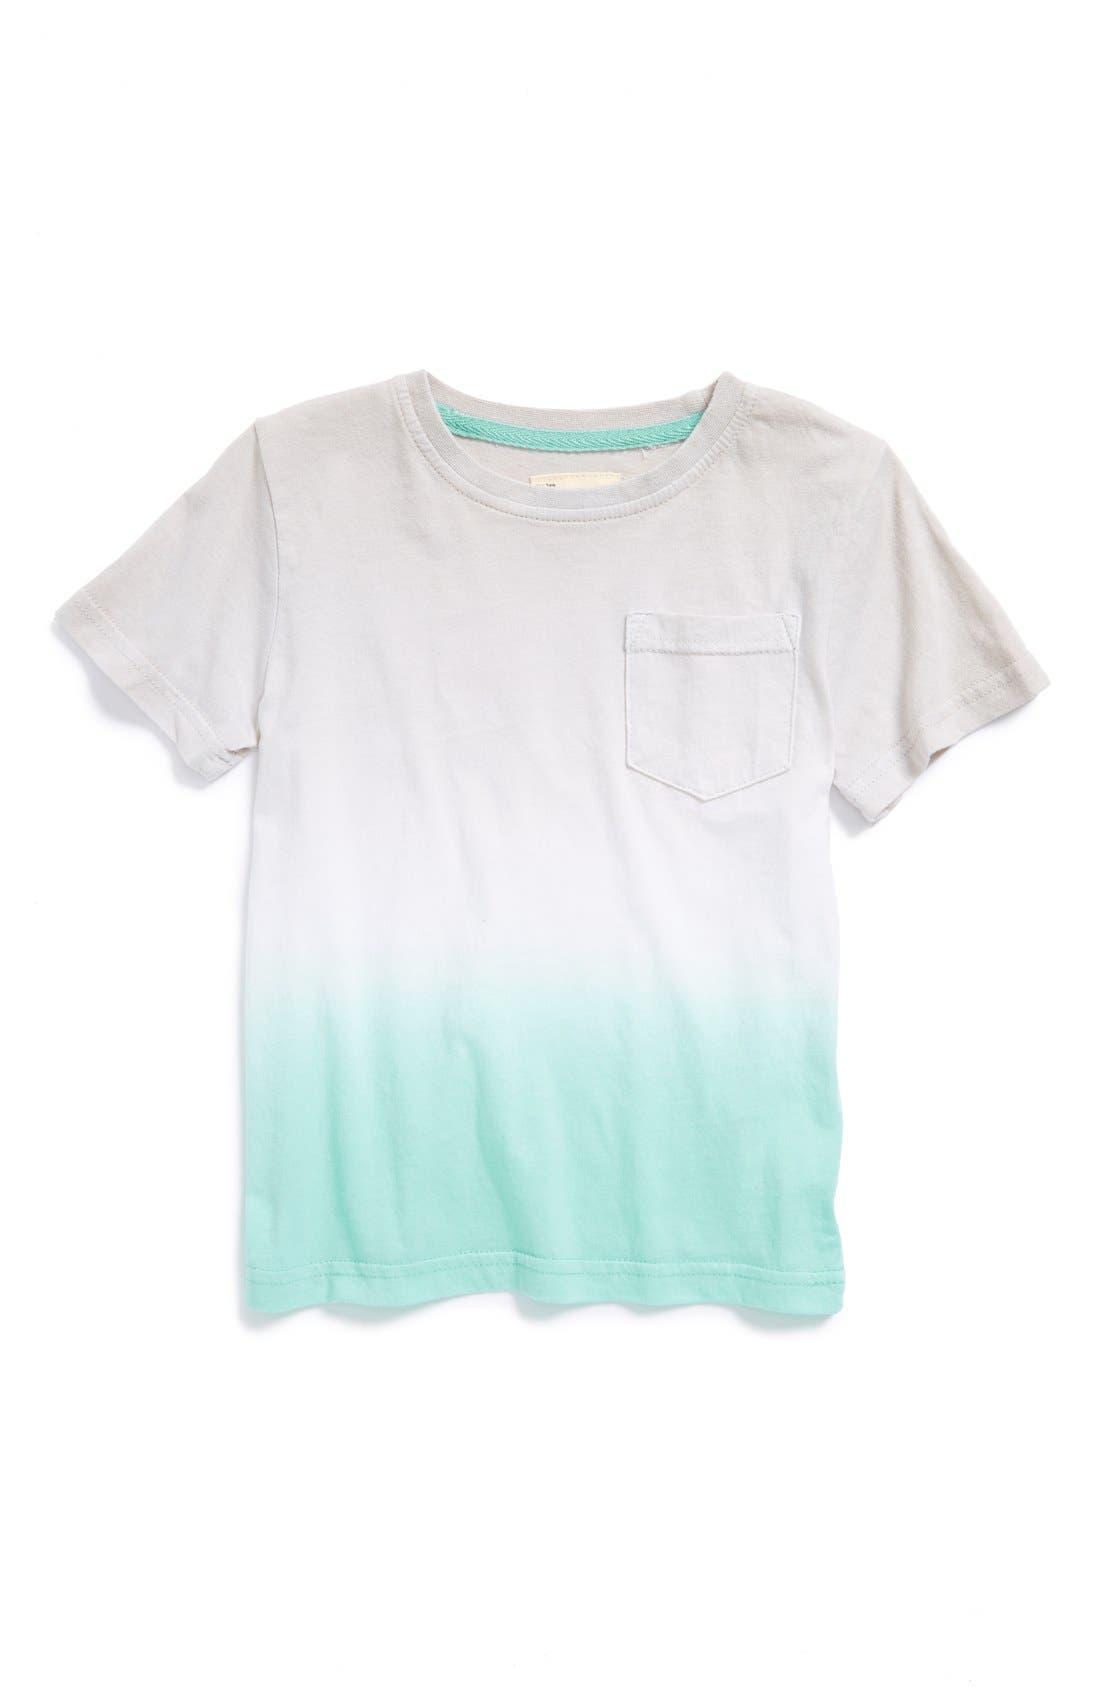 Alternate Image 1 Selected - Sovereign Code 'Triple Dip' Short Sleeve Shirt (Toddler Boys)